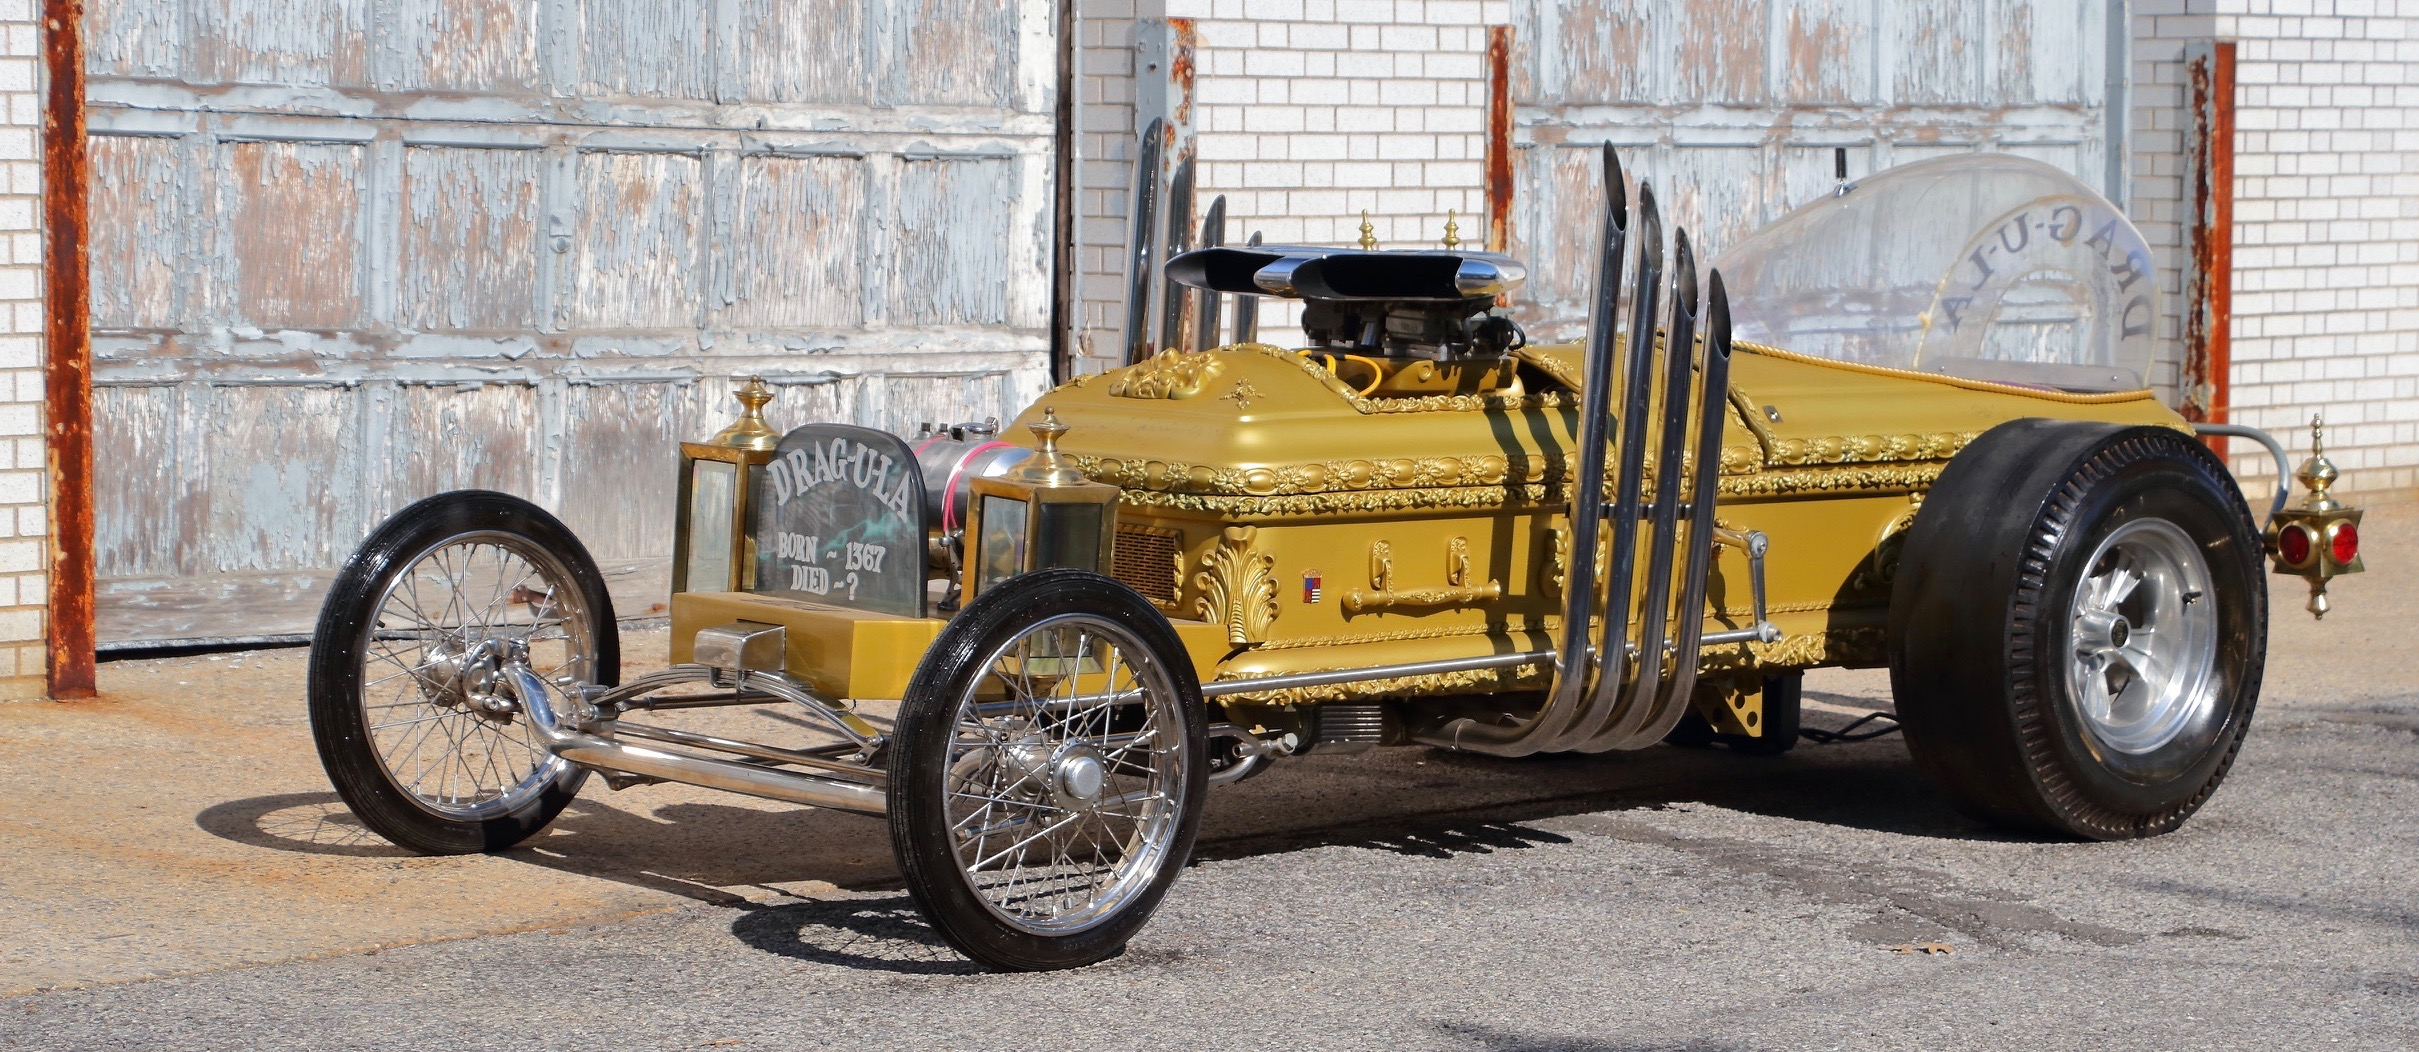 Harrisburg, Harrisburg holds promise of eclectic docket, ClassicCars.com Journal